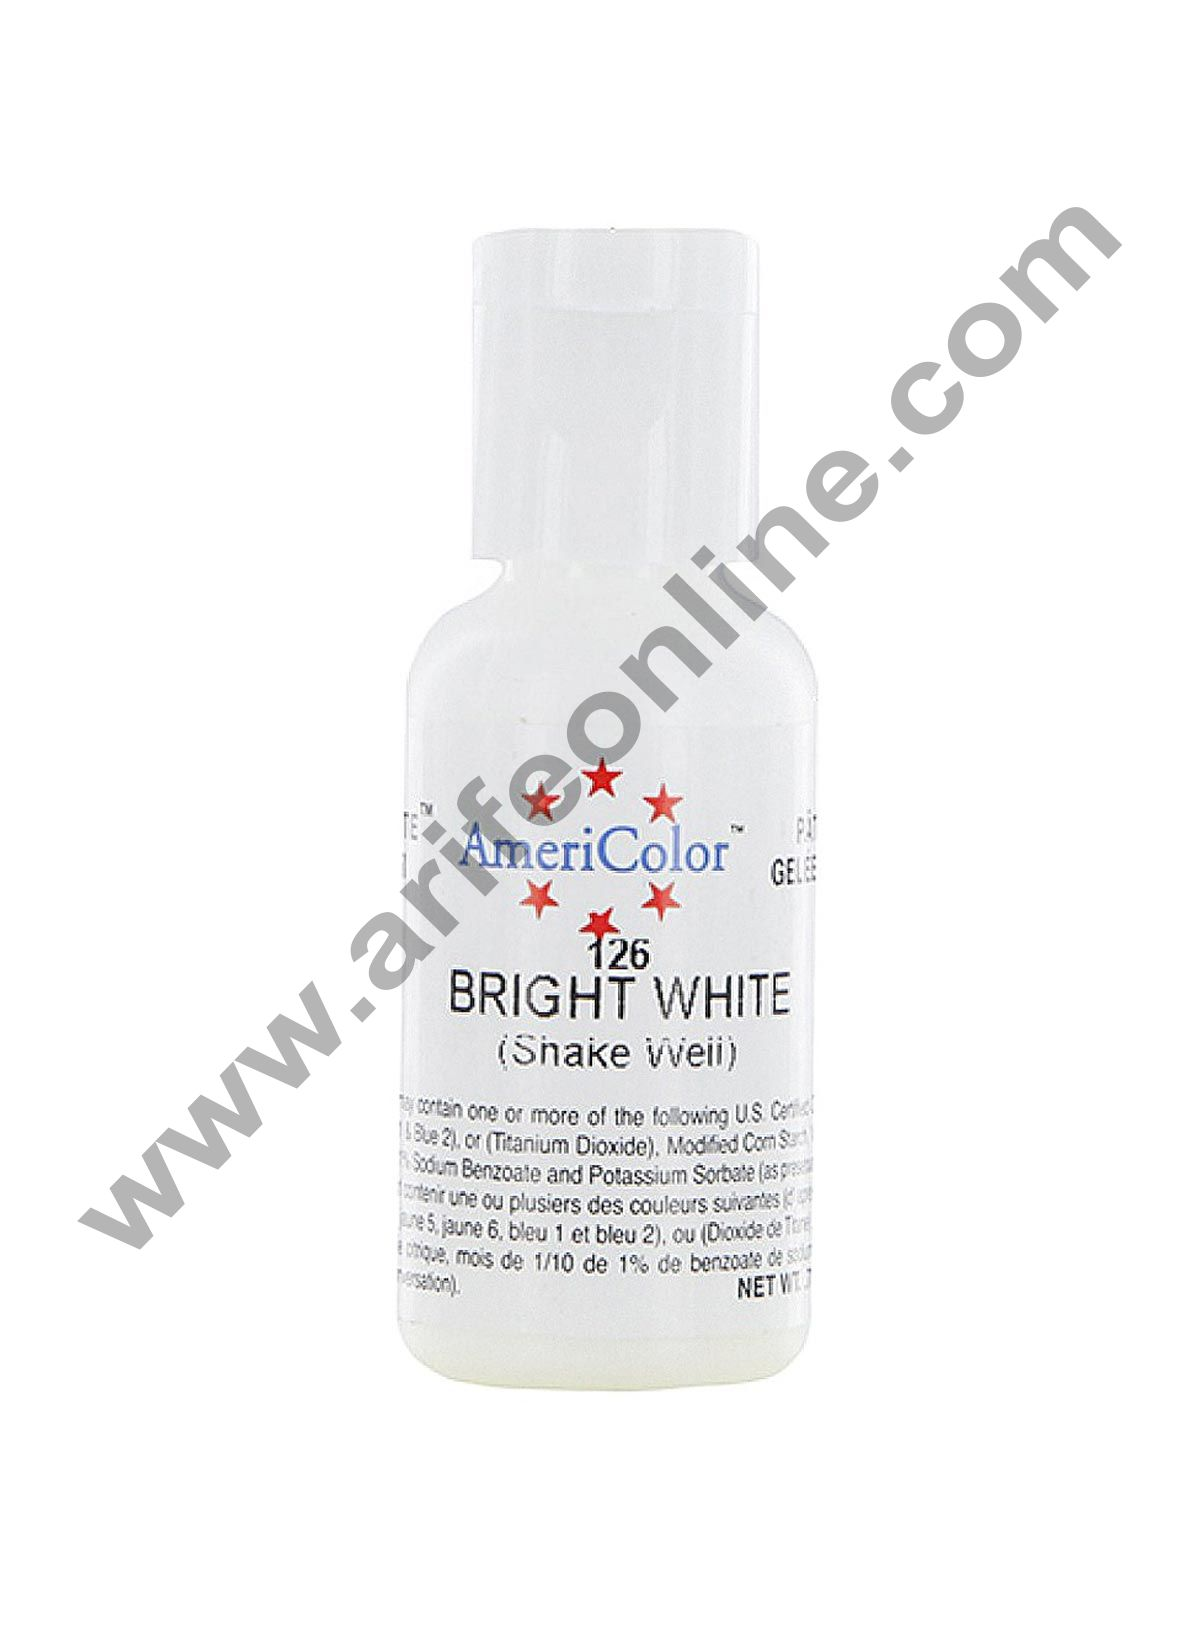 AmeriColor Bright White 0.75 oz Soft Gel Paste Food Color (21g)